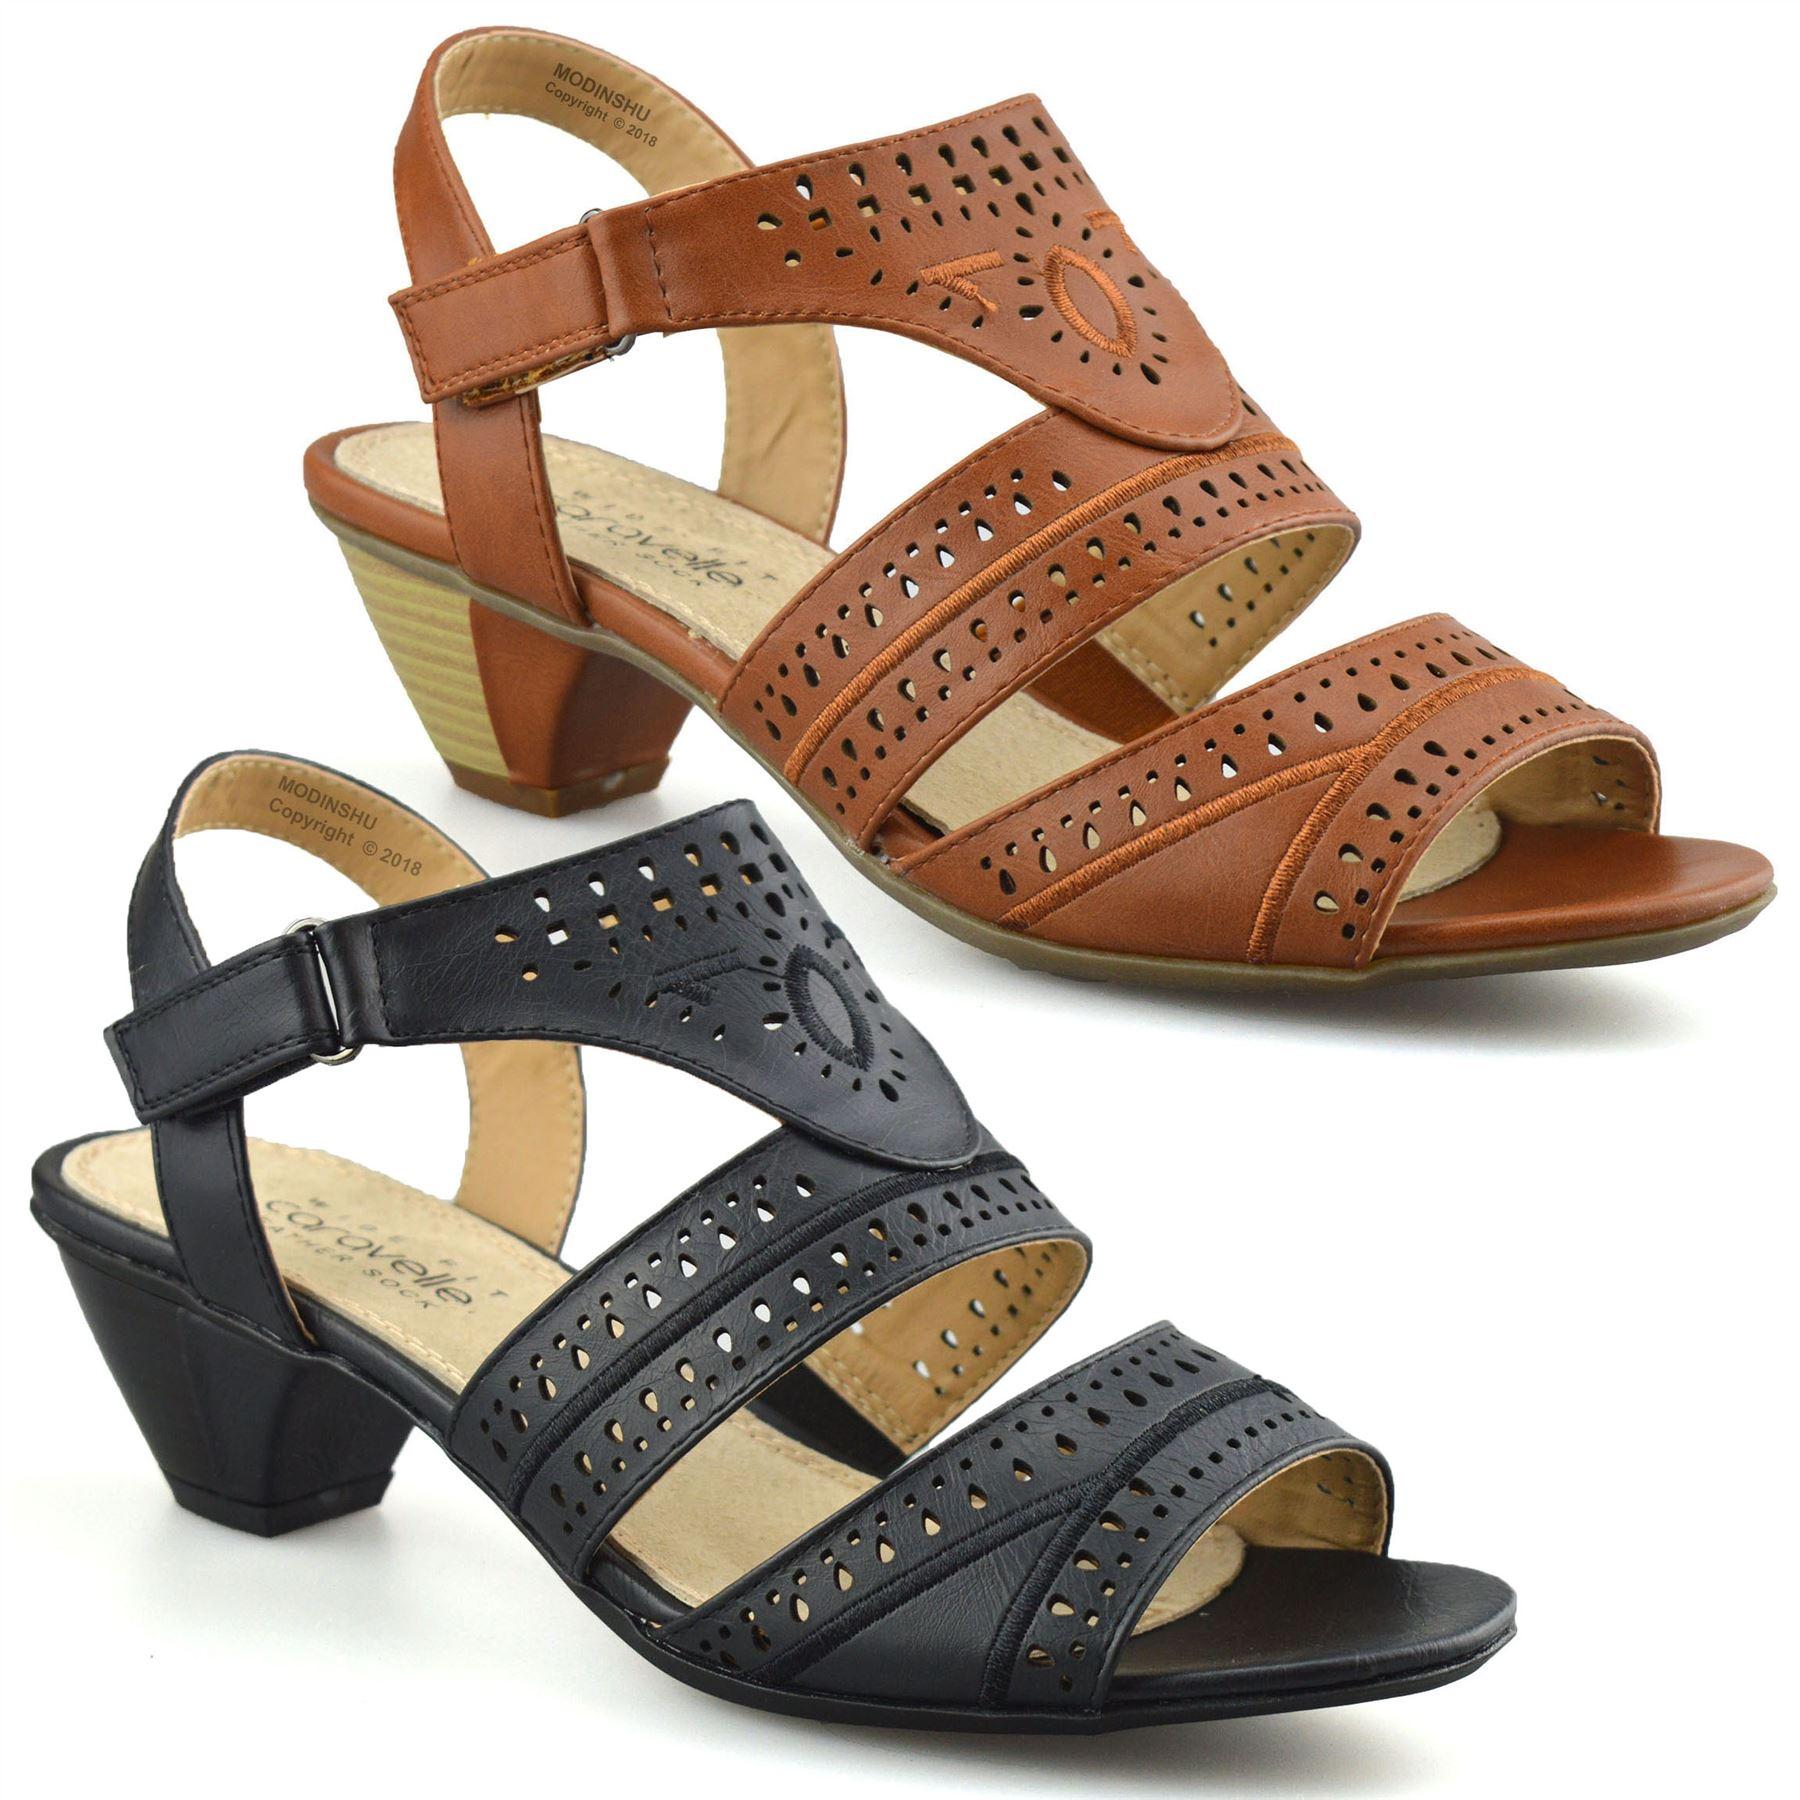 571ed8cca98c Ladies Womens Mid Wedge Heel Wide Fit Casual Comfort Walking Sandals Shoes